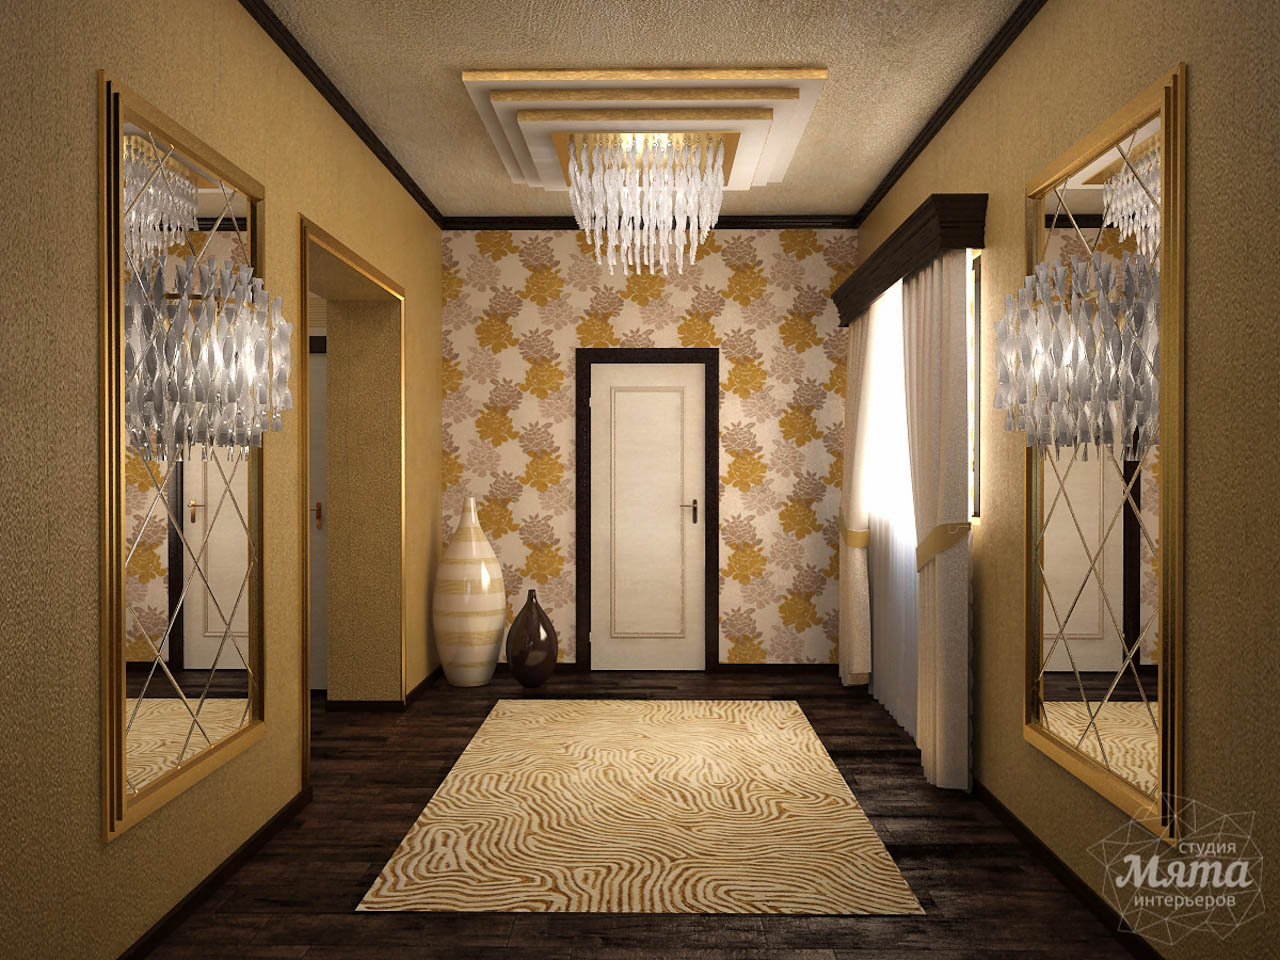 Дизайн интерьера коттеджа по ул. Ландышевая 23 img302839862